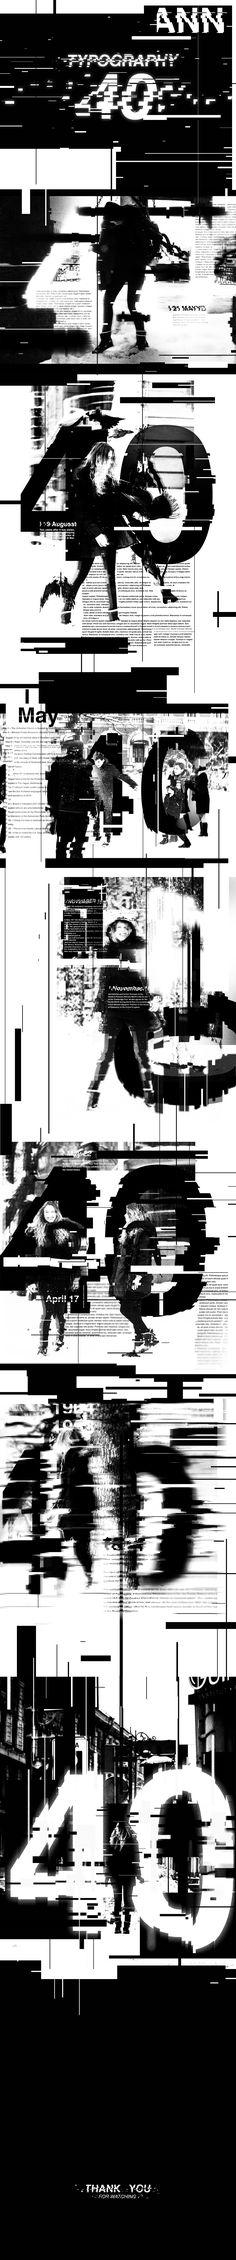 TypeGirl #art #artist #design #designer #typography #helvetica #girl #photography #photo #balckandwhite #b&w #glitch #text #number #type